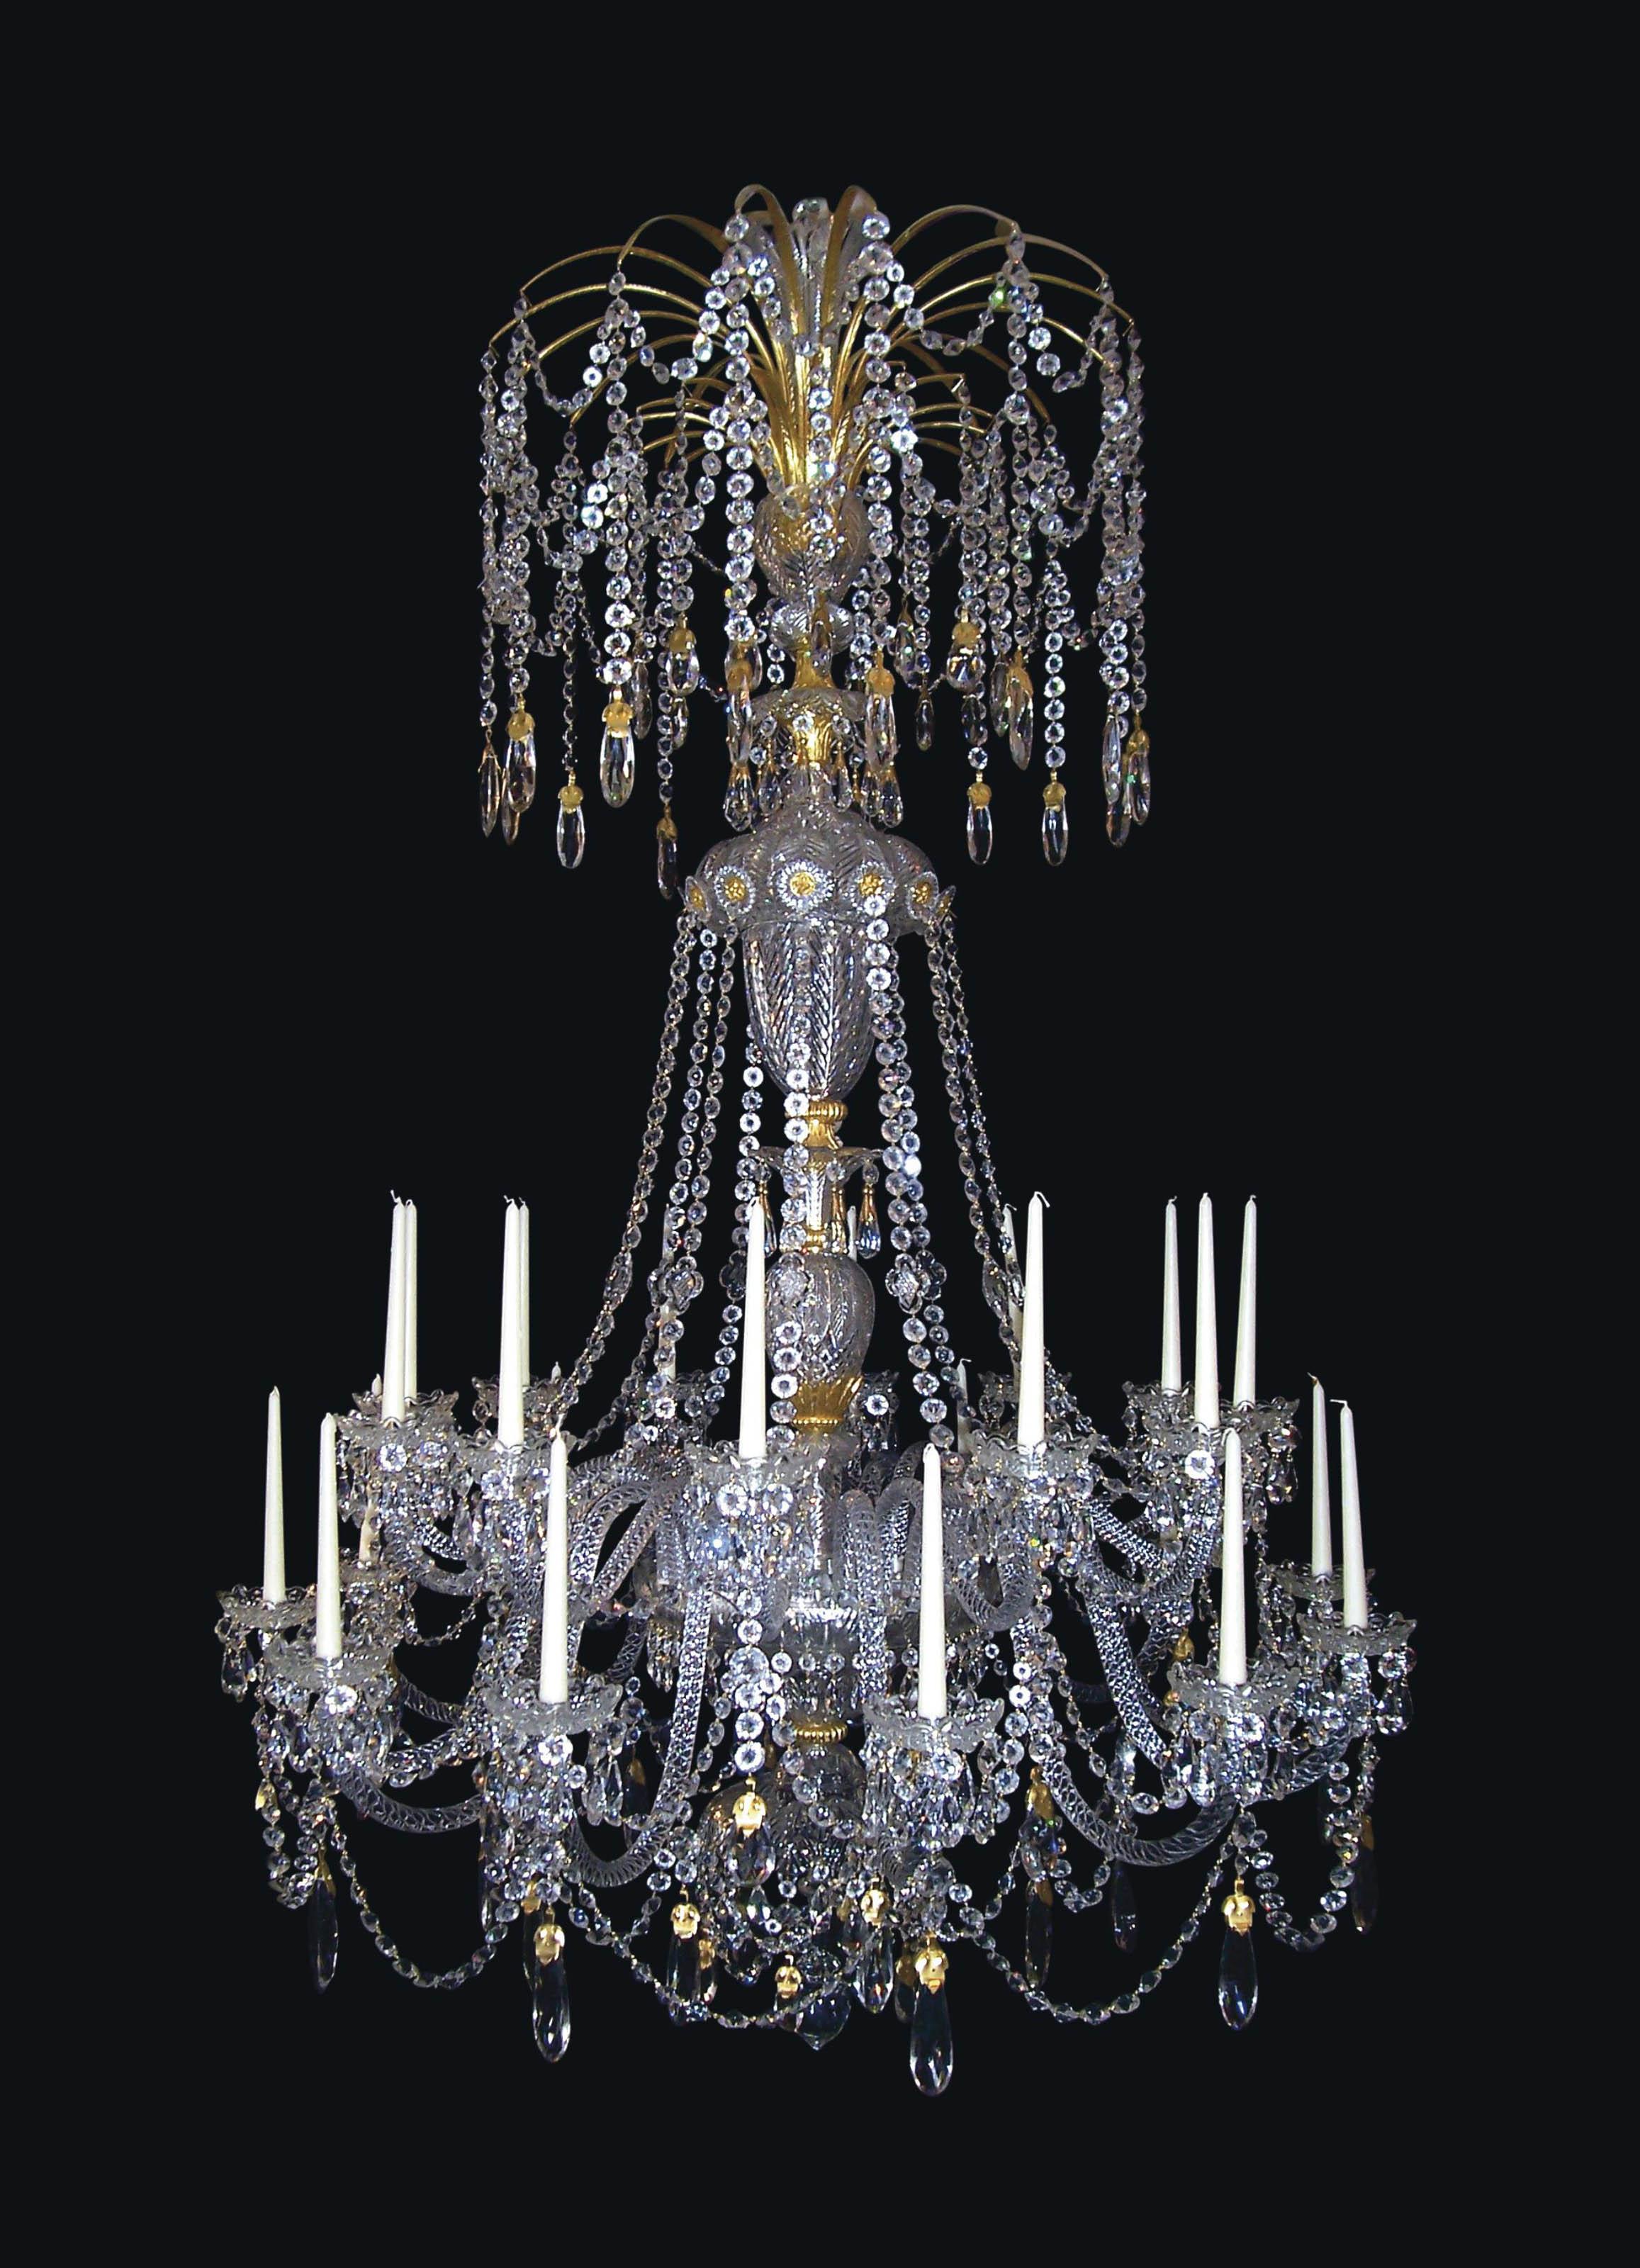 A VICTORIAN ORMOLU AND CUT GLASS TWENTY-FOUR-LIGHT CHANDELIER